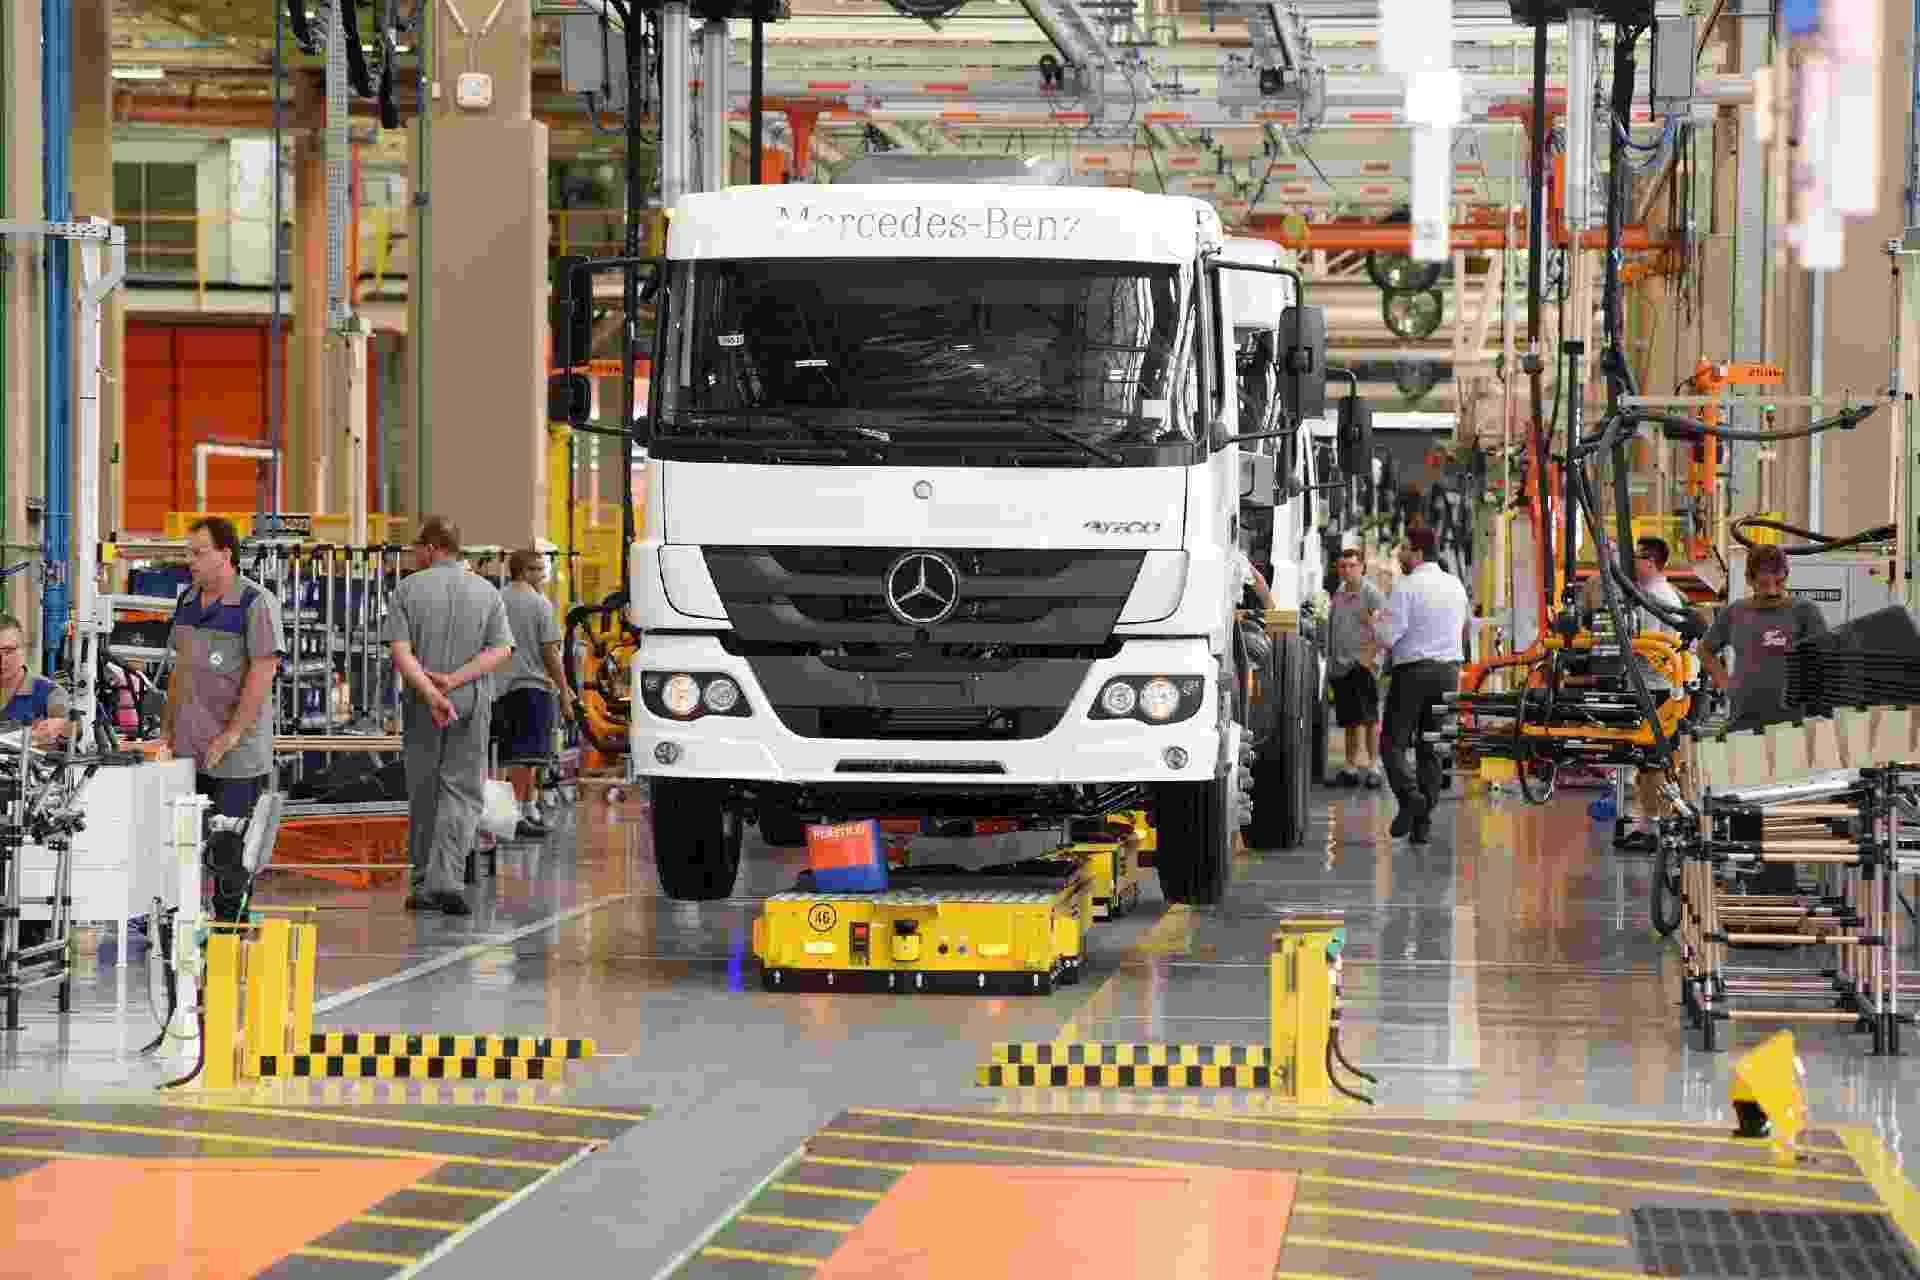 Fábrica 4.0 Mercedes-Benz - Murilo Góes/UOL